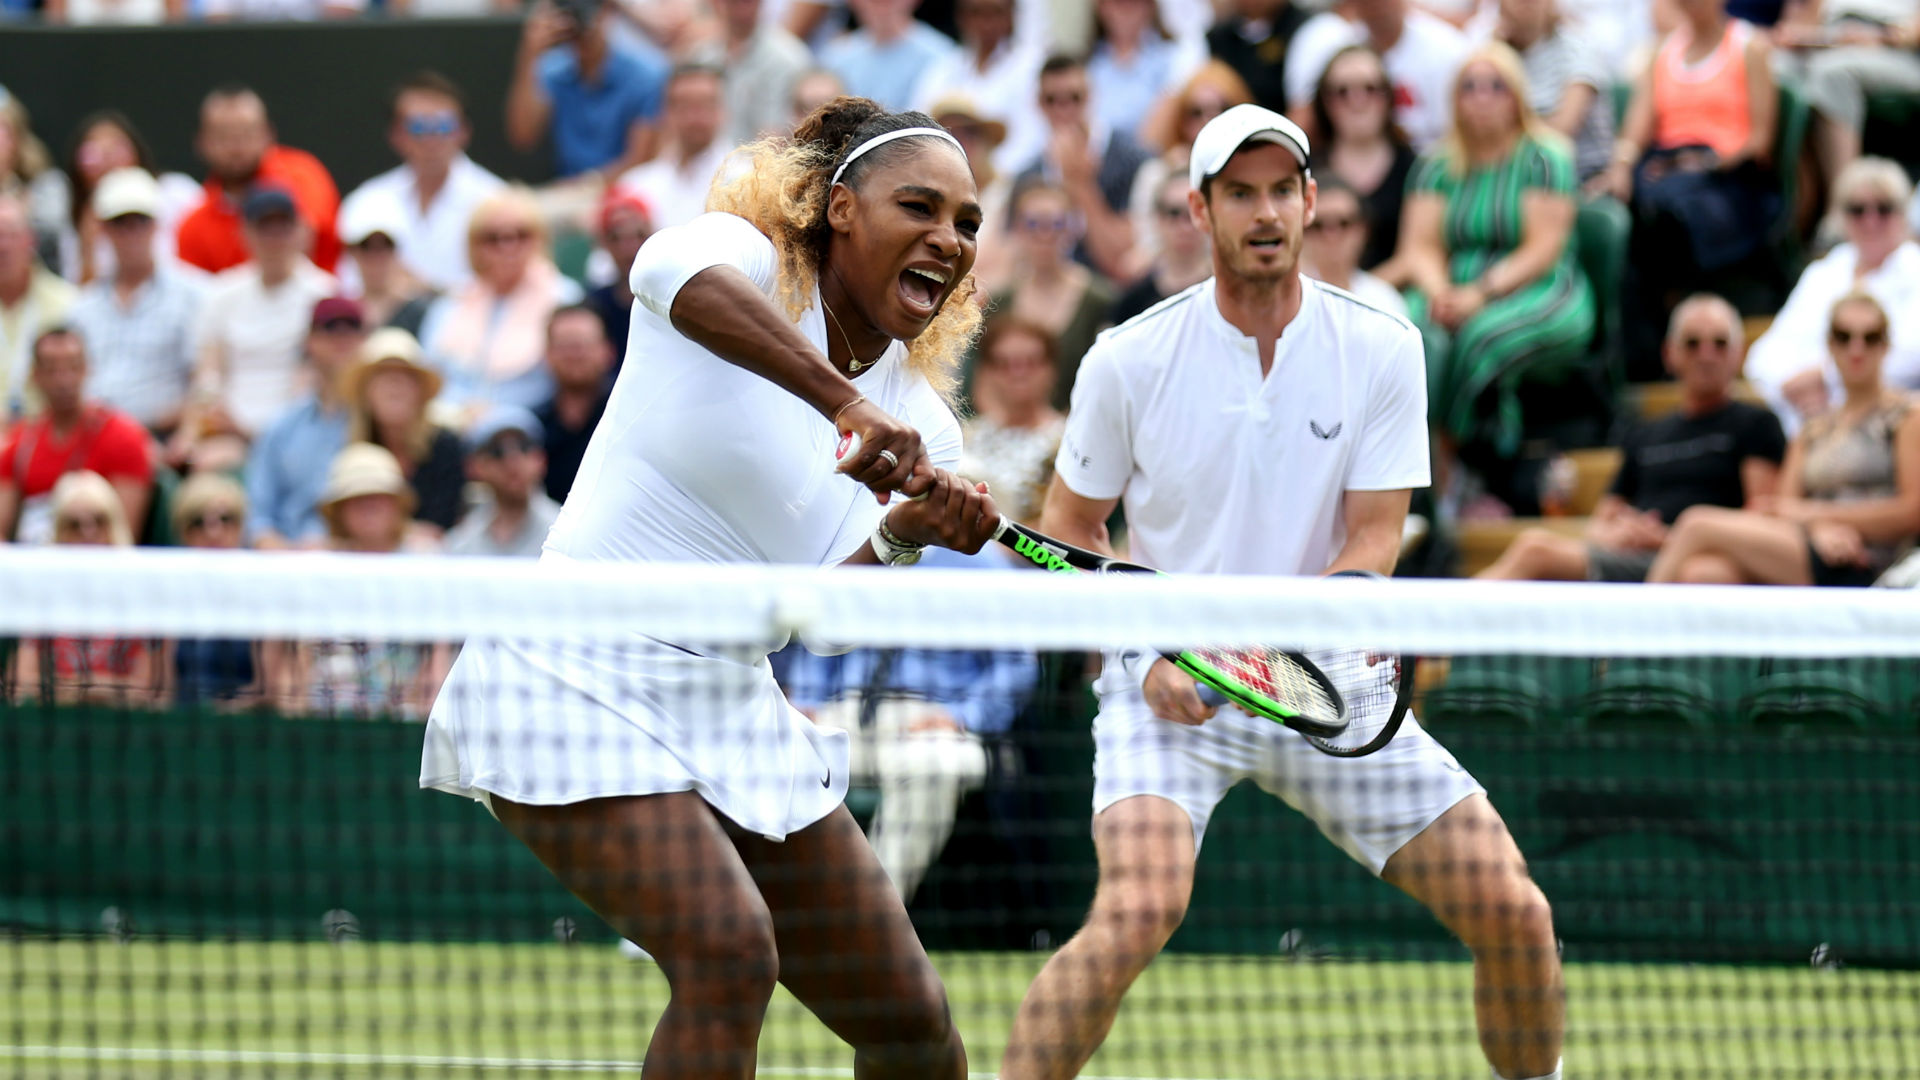 Serena-Murray dream team thwarted